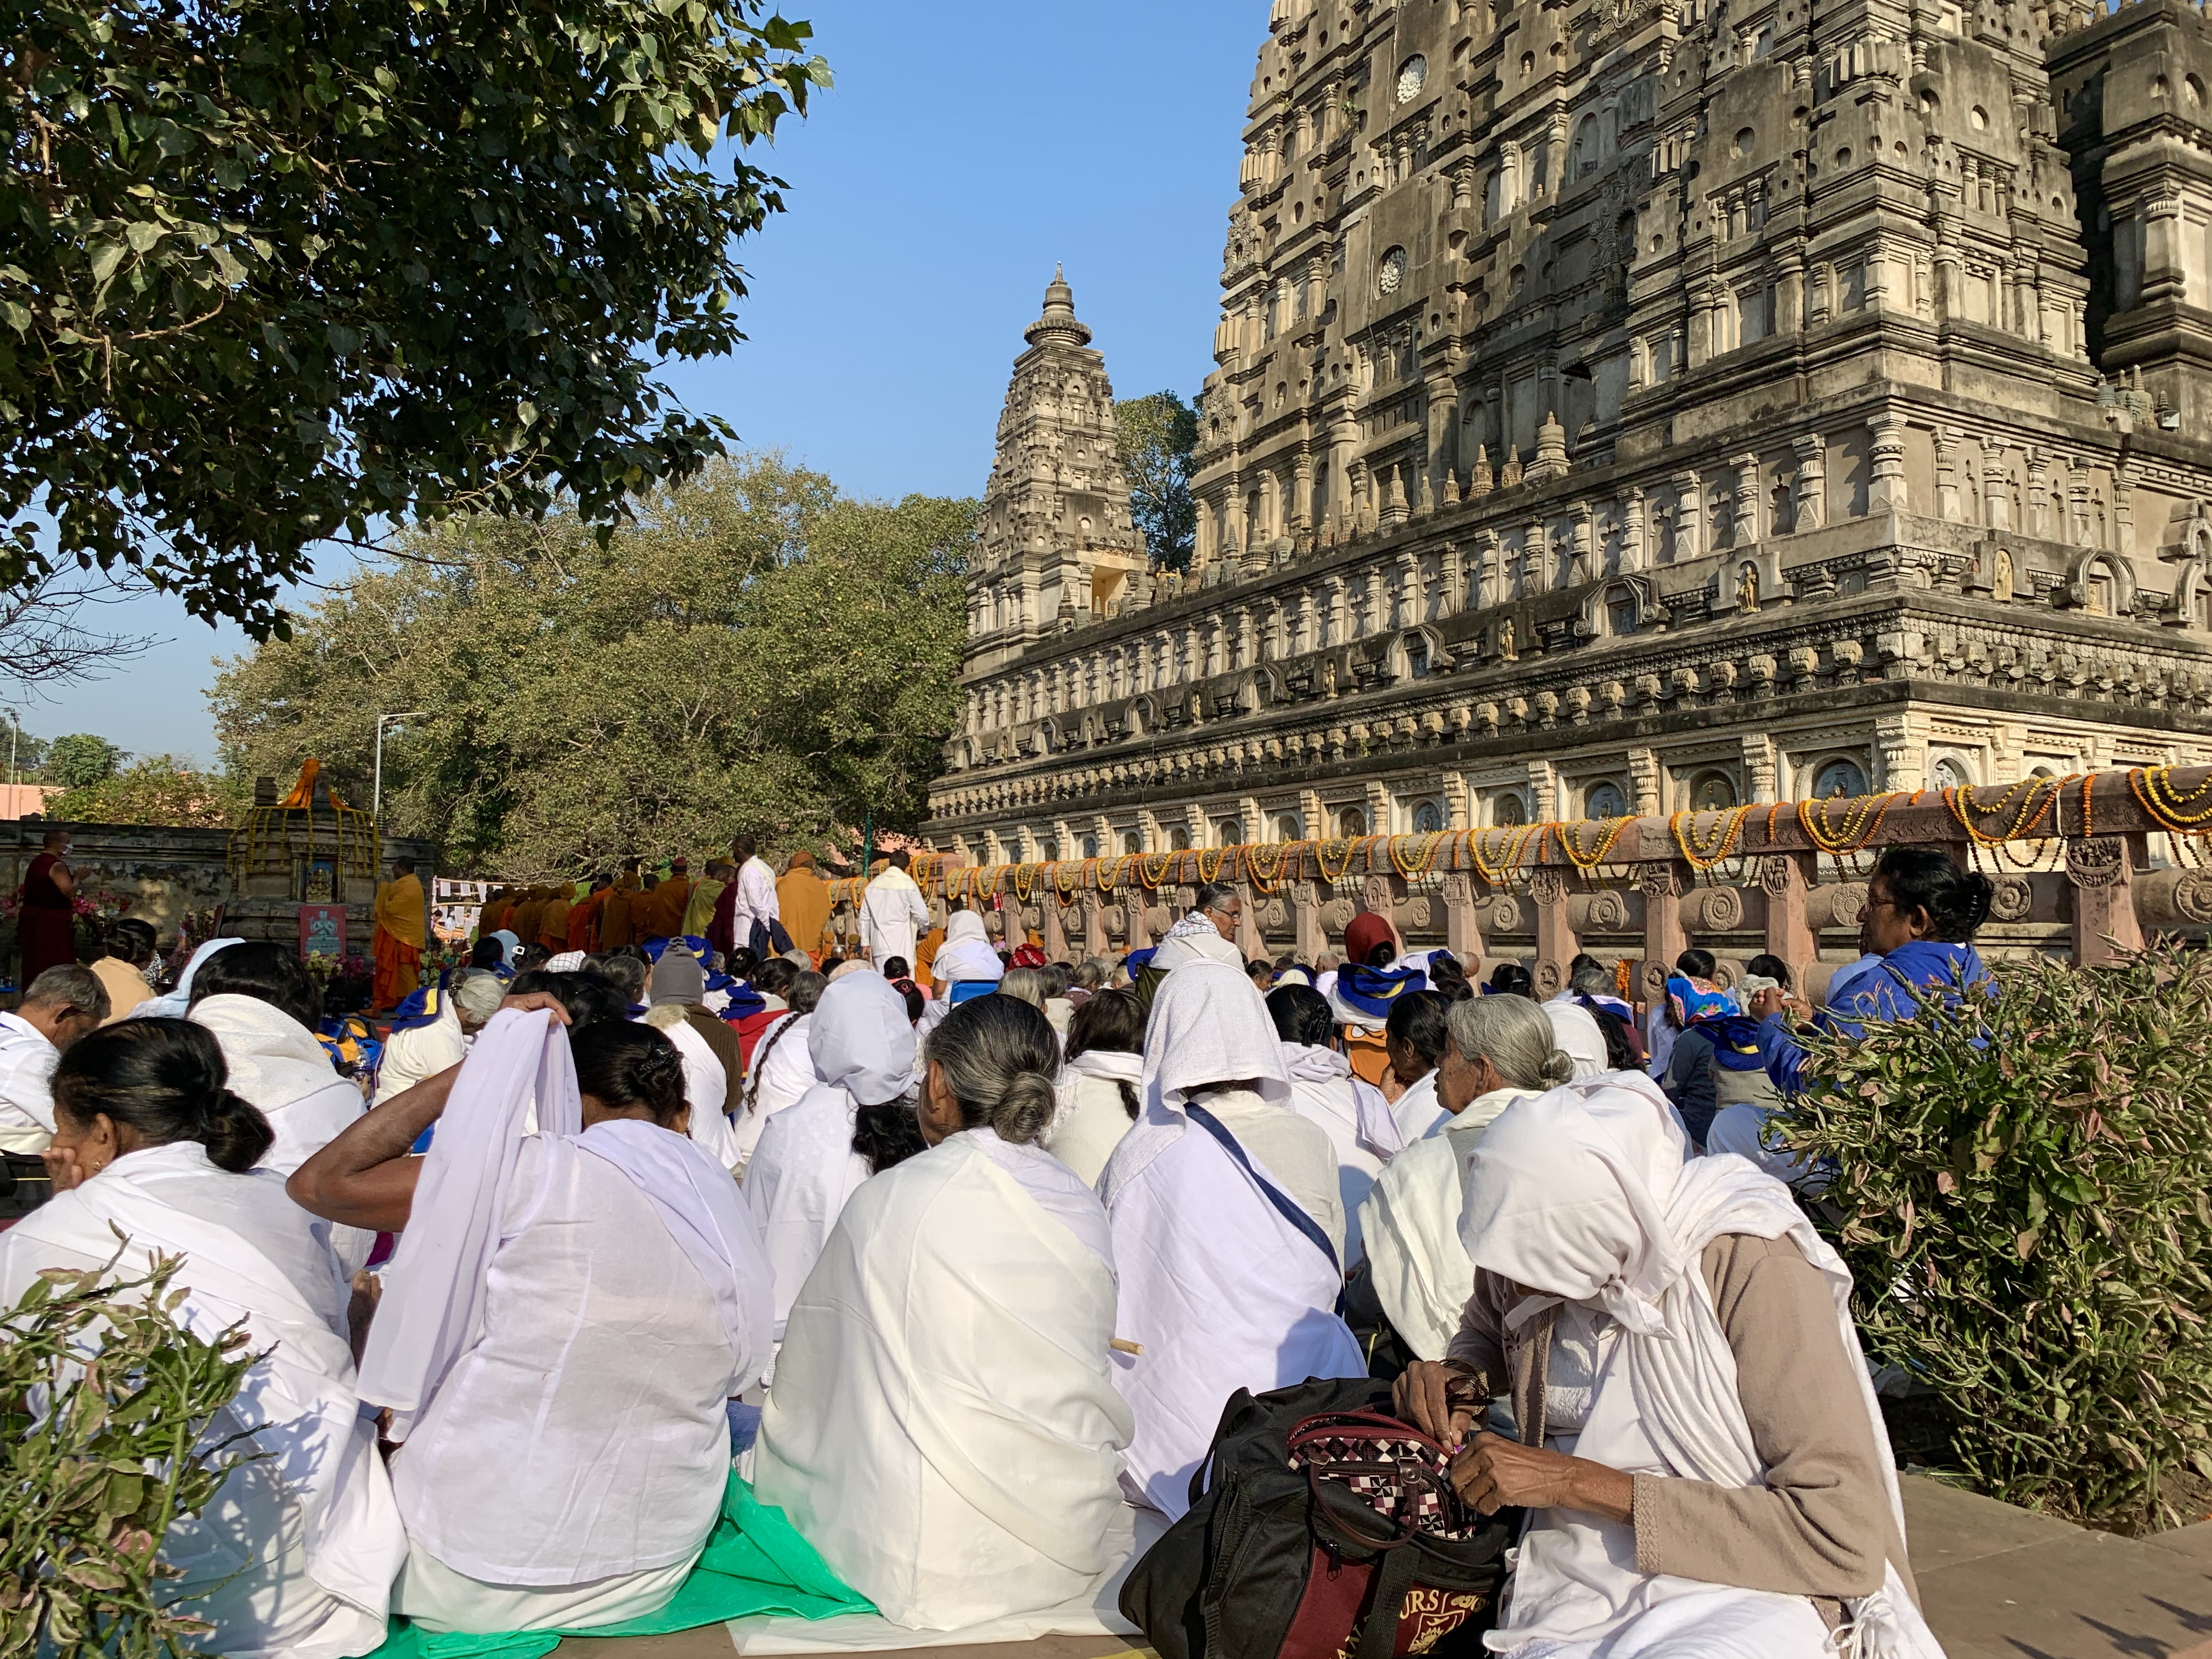 Praktizierende am Mahabodhi-Tempel. Rigpa Gebetsfest, März 2019, Bodhgaya (Indien)